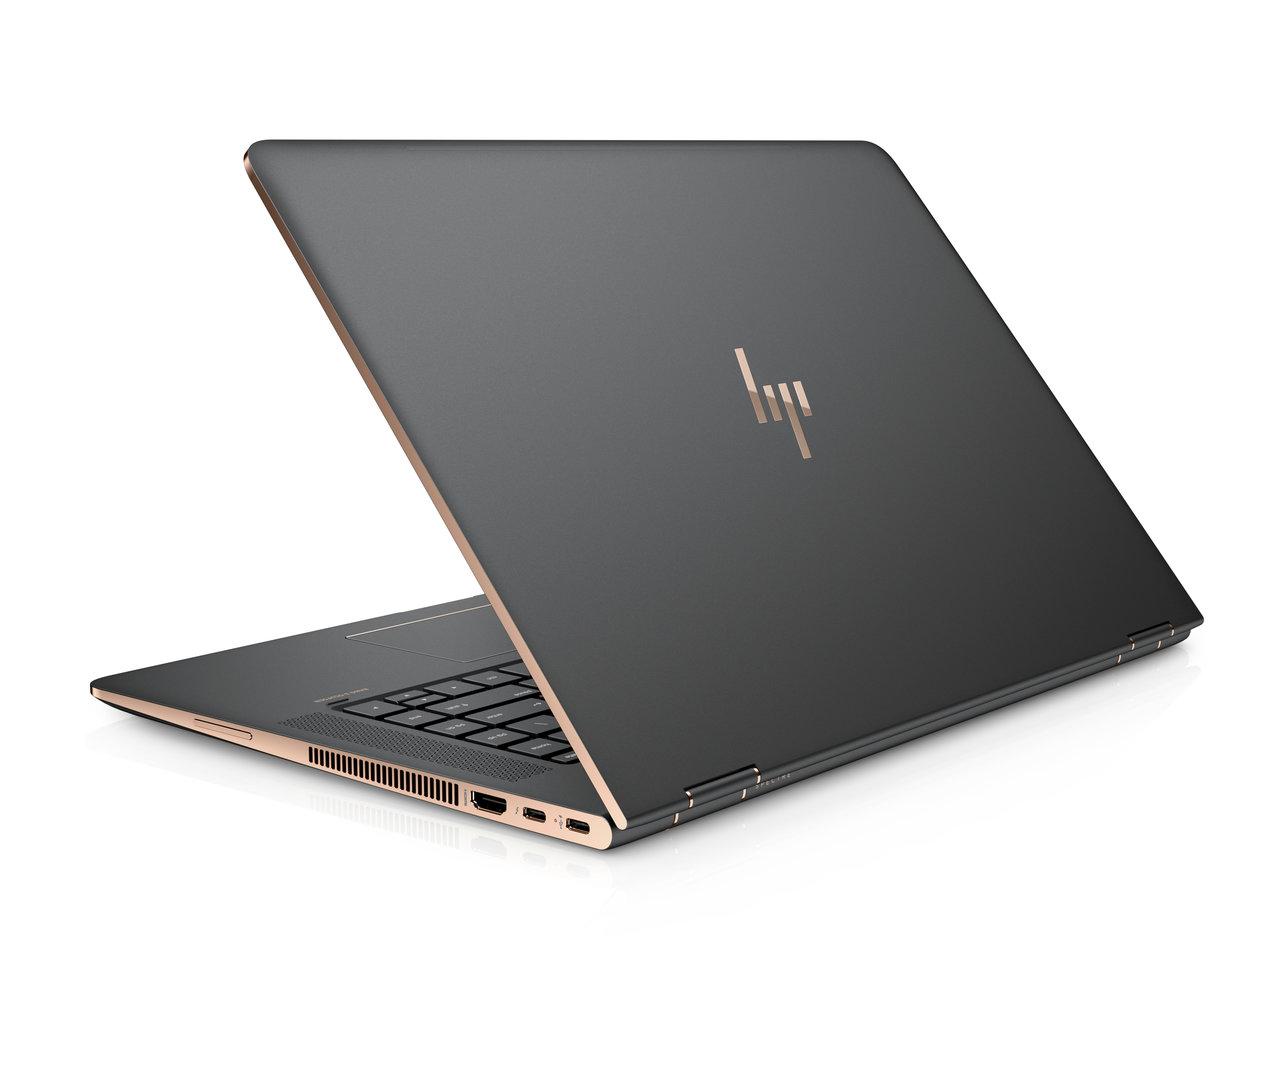 HP Spectre x360 15 Zoll (2017)